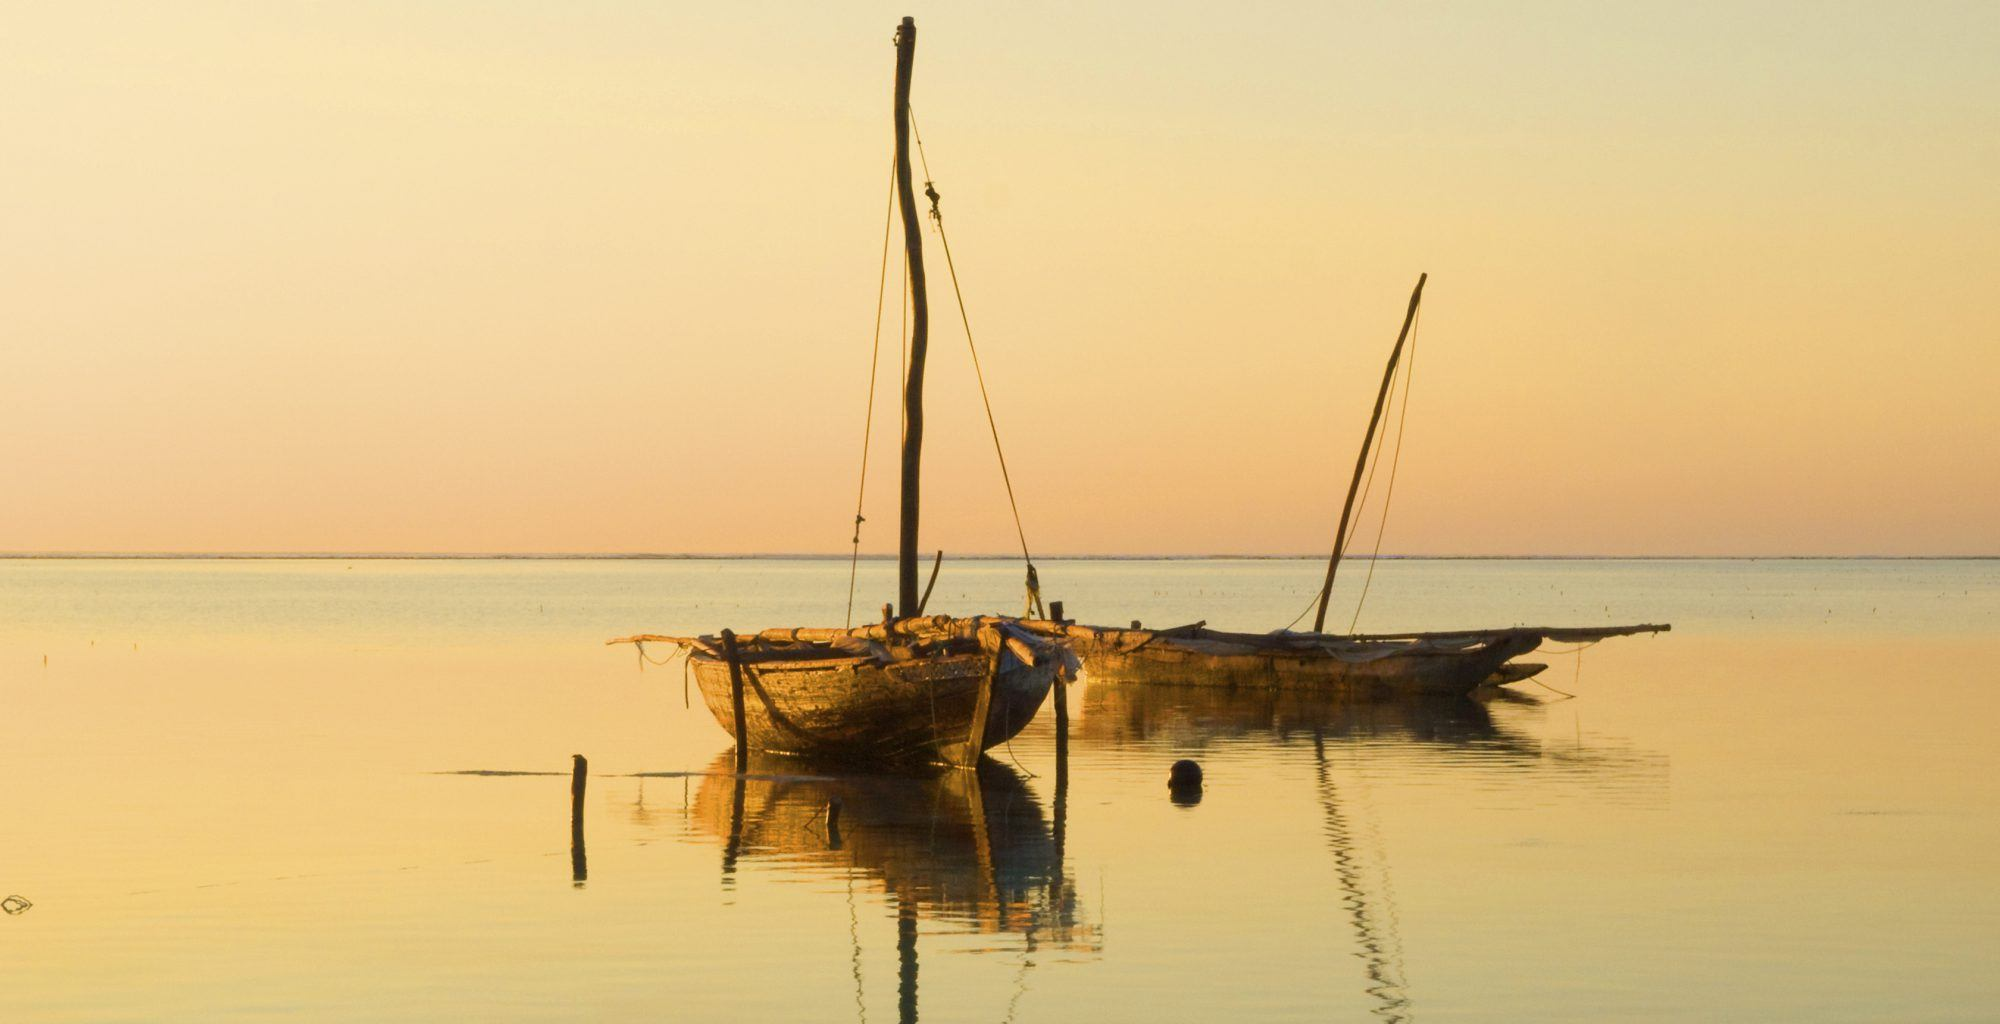 Zanzibar-Archipelago-Boat-on-Beach